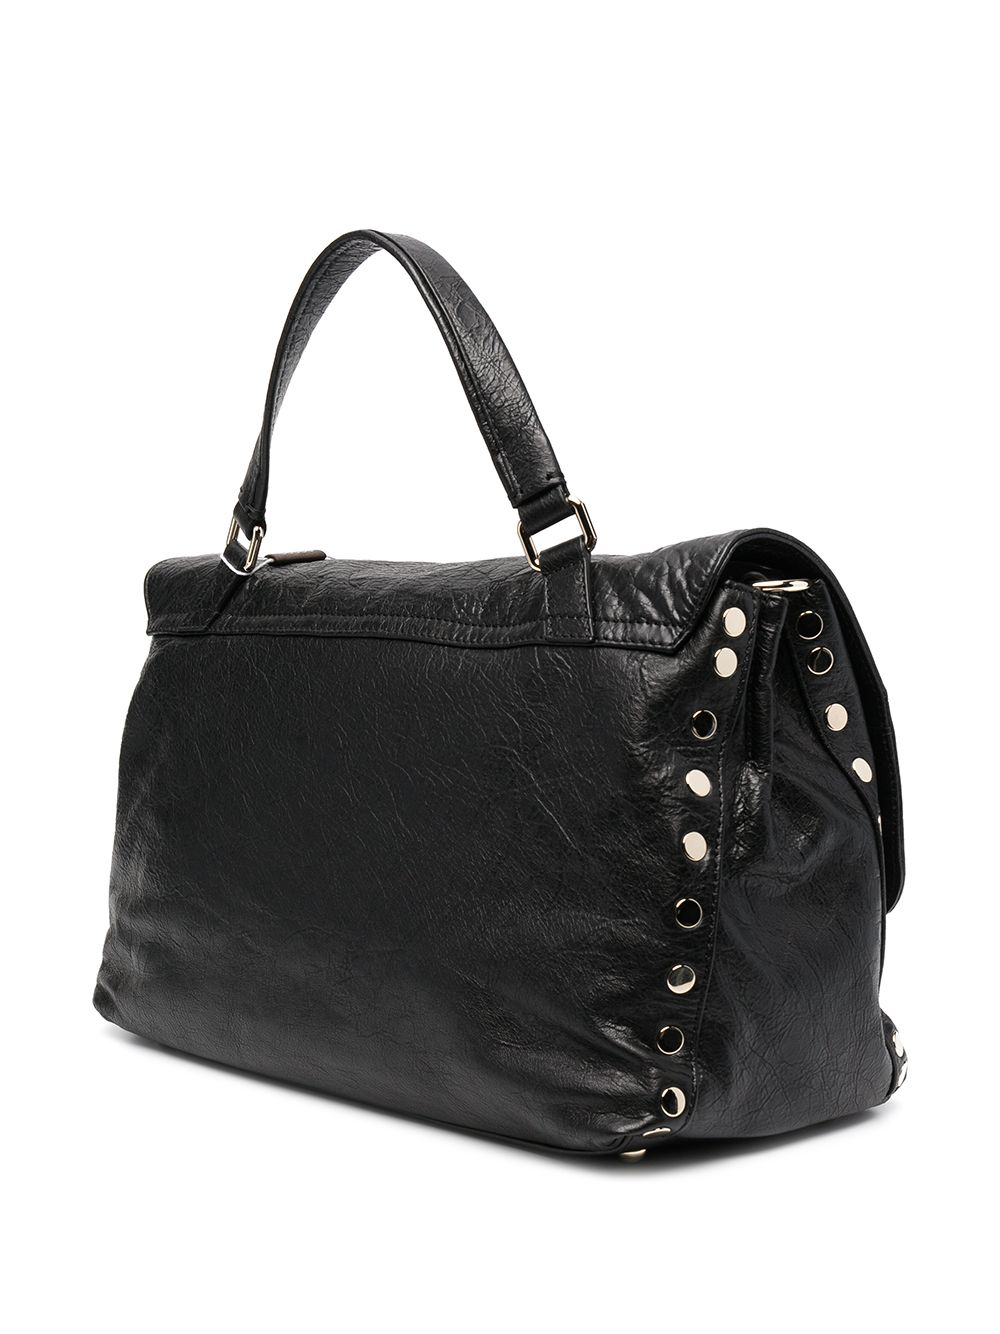 Picture of Zanellato | Crinkled Lambskin Tote Bag